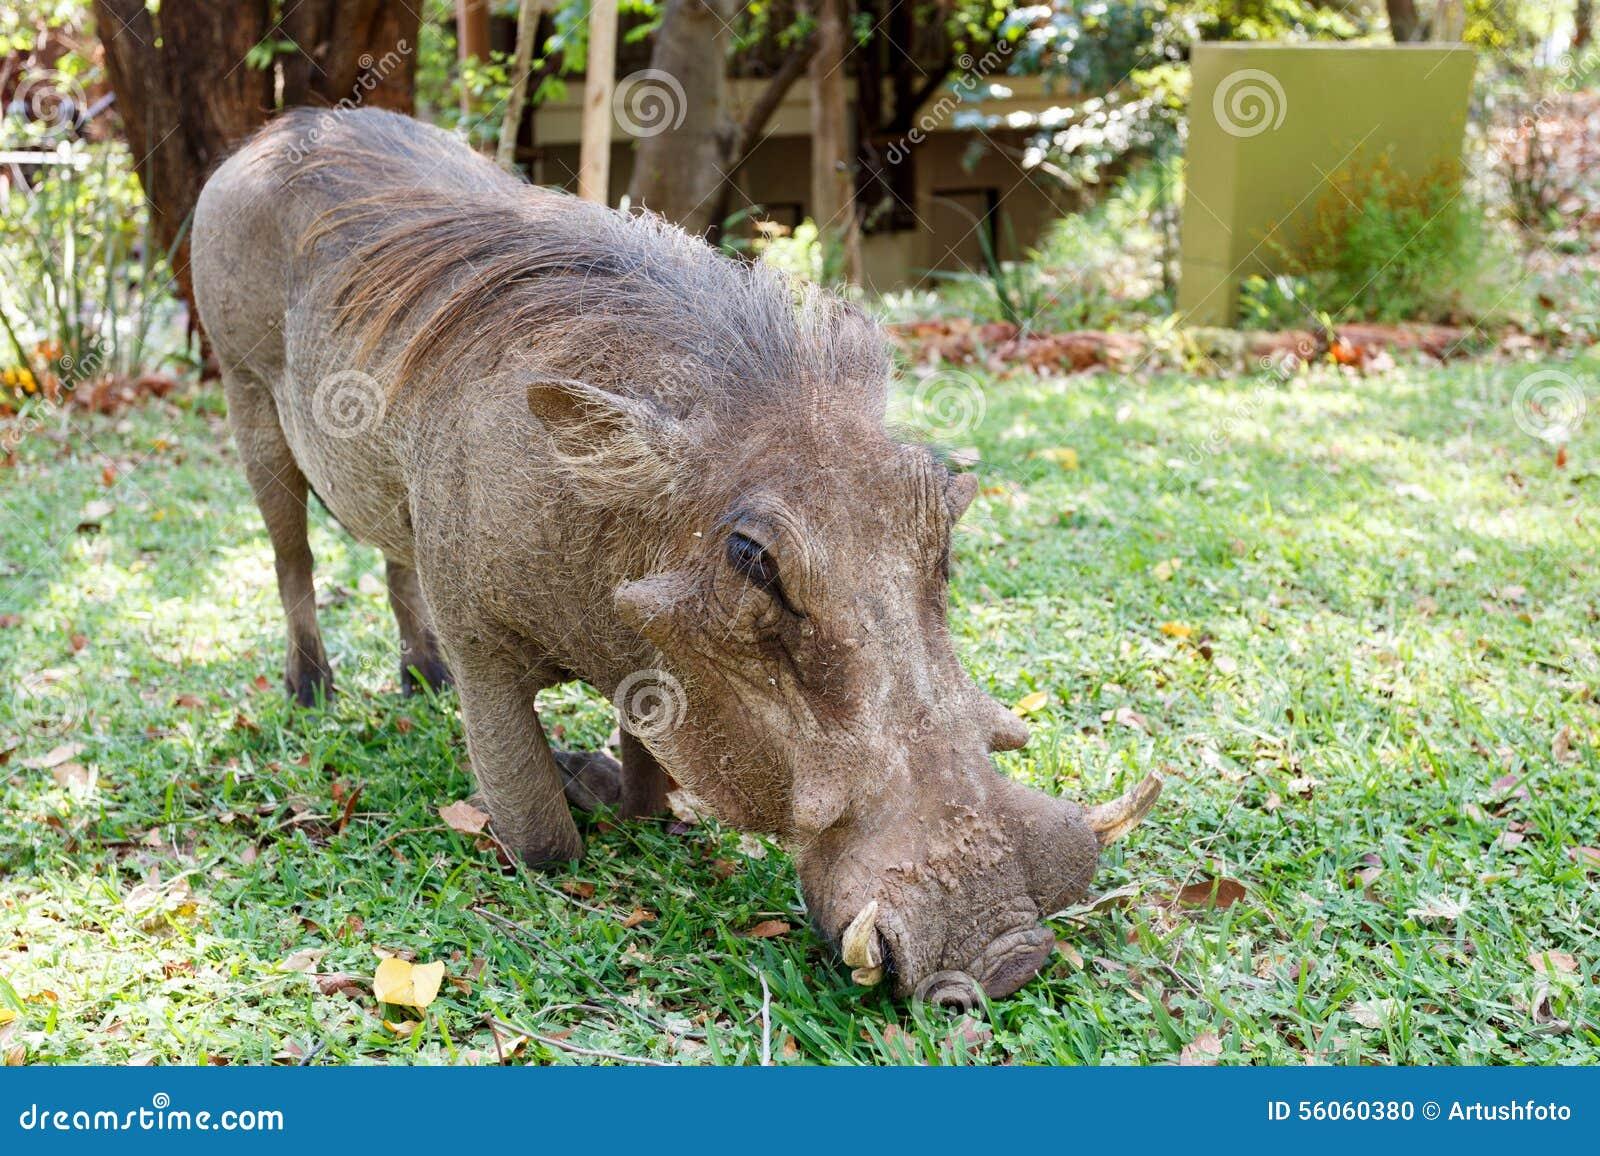 Close up portrait of wart hog male in campsite